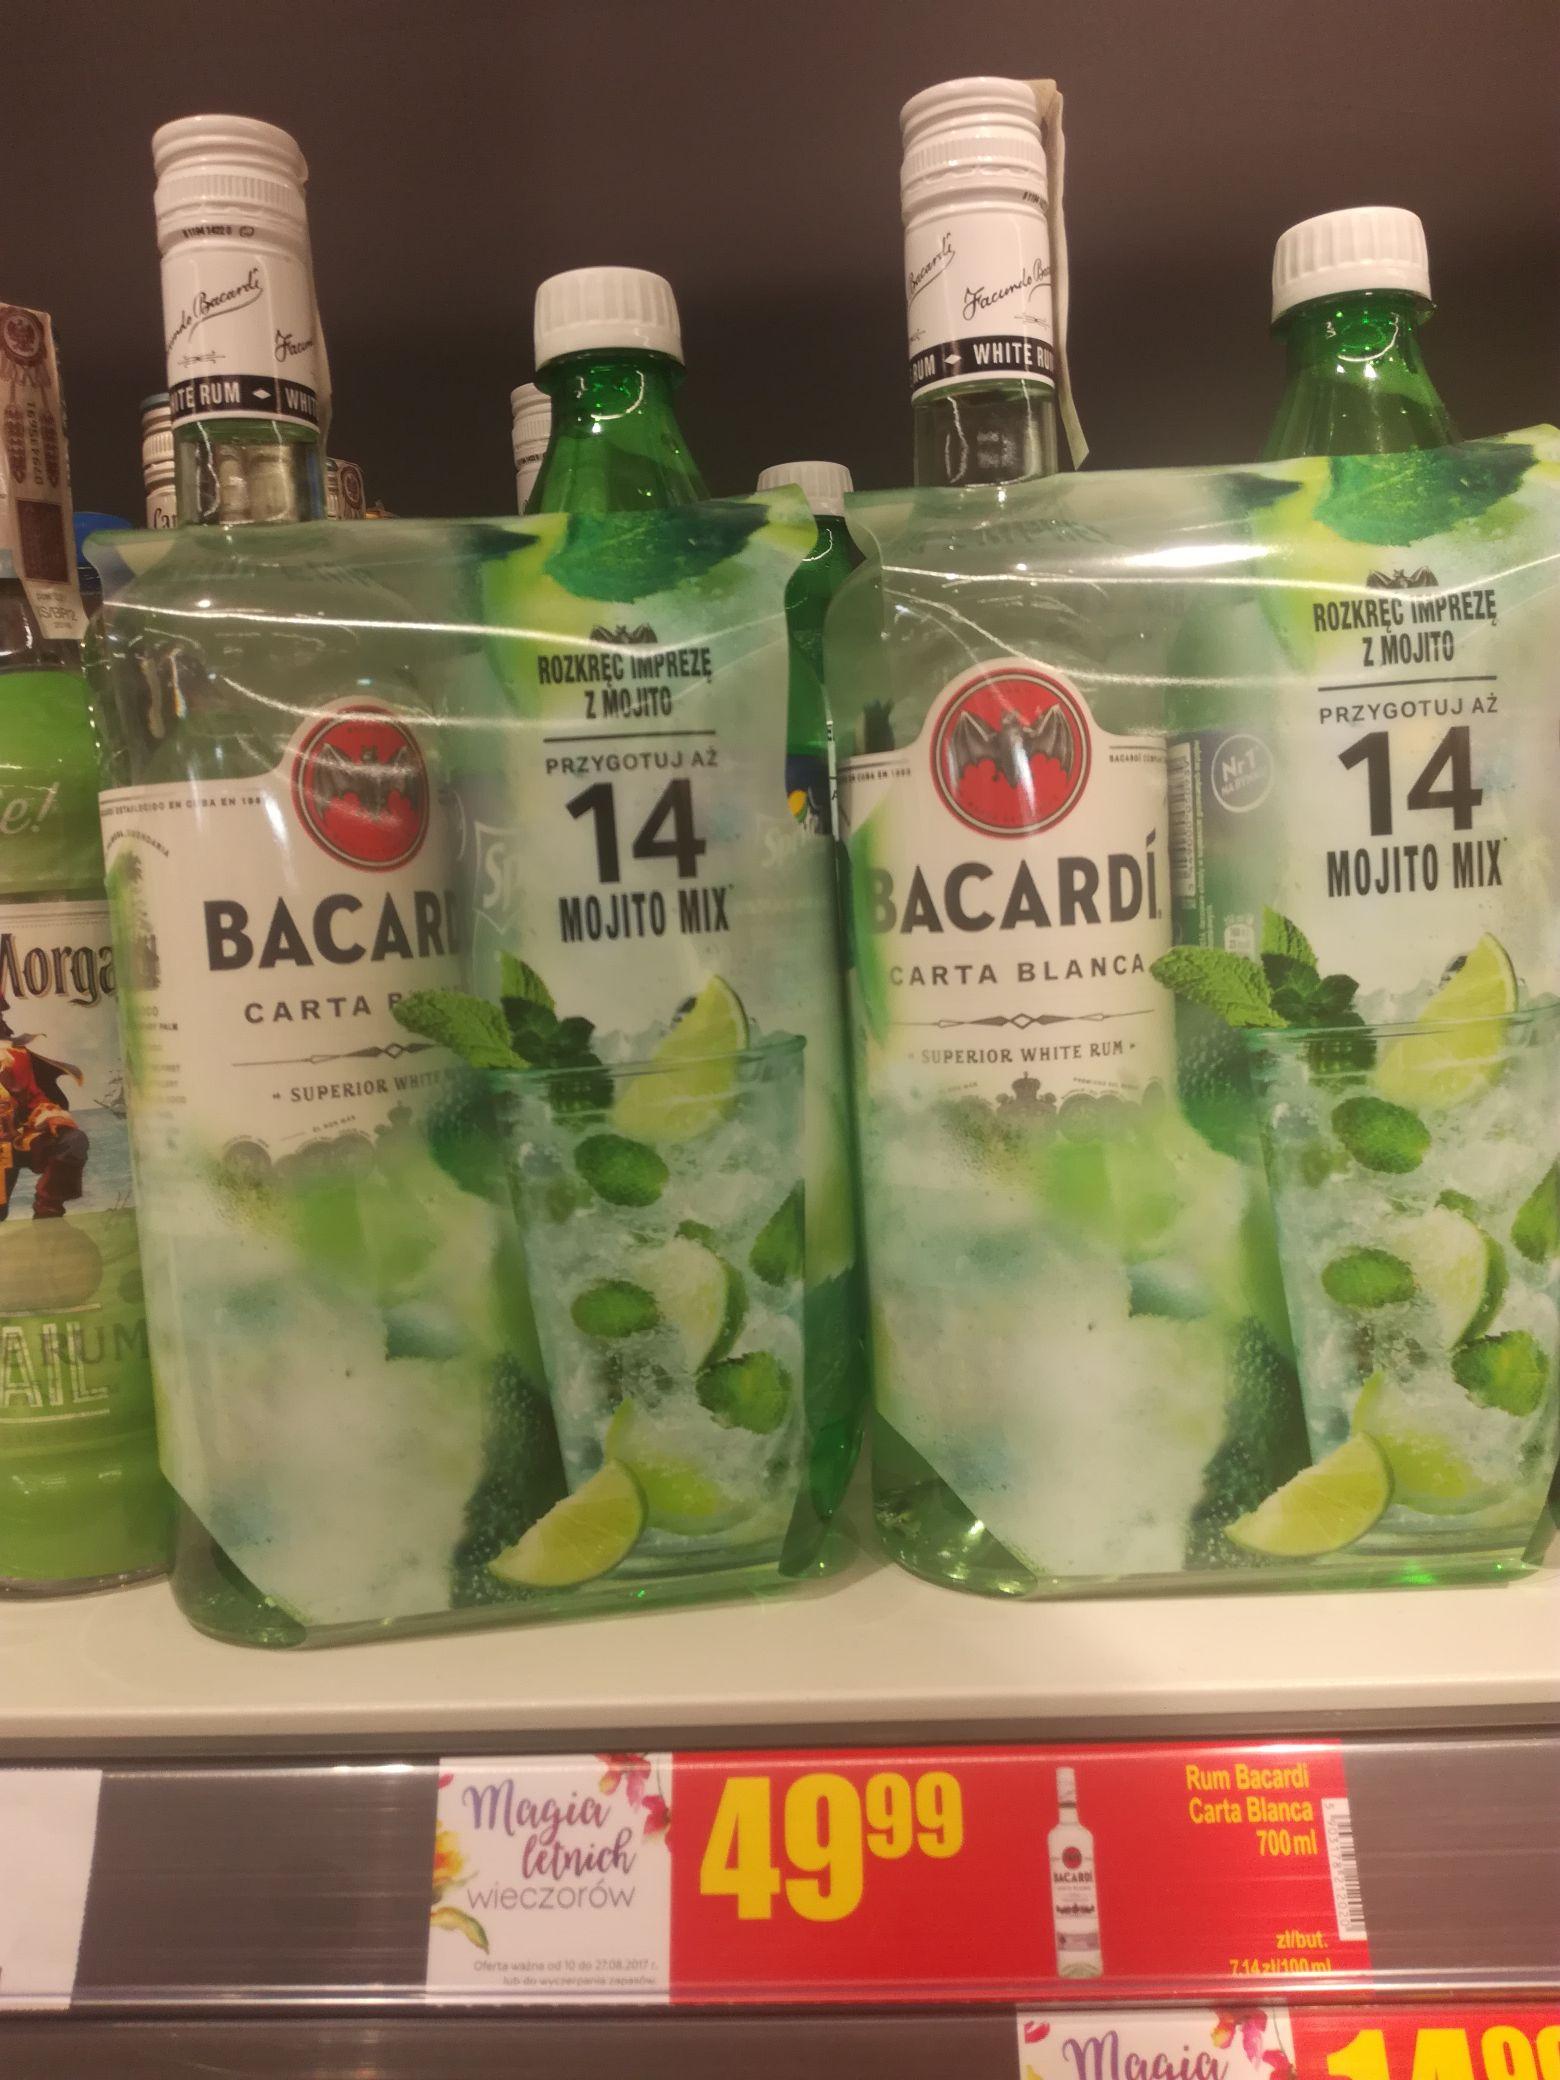 Bacardi 0,7 49.99zl